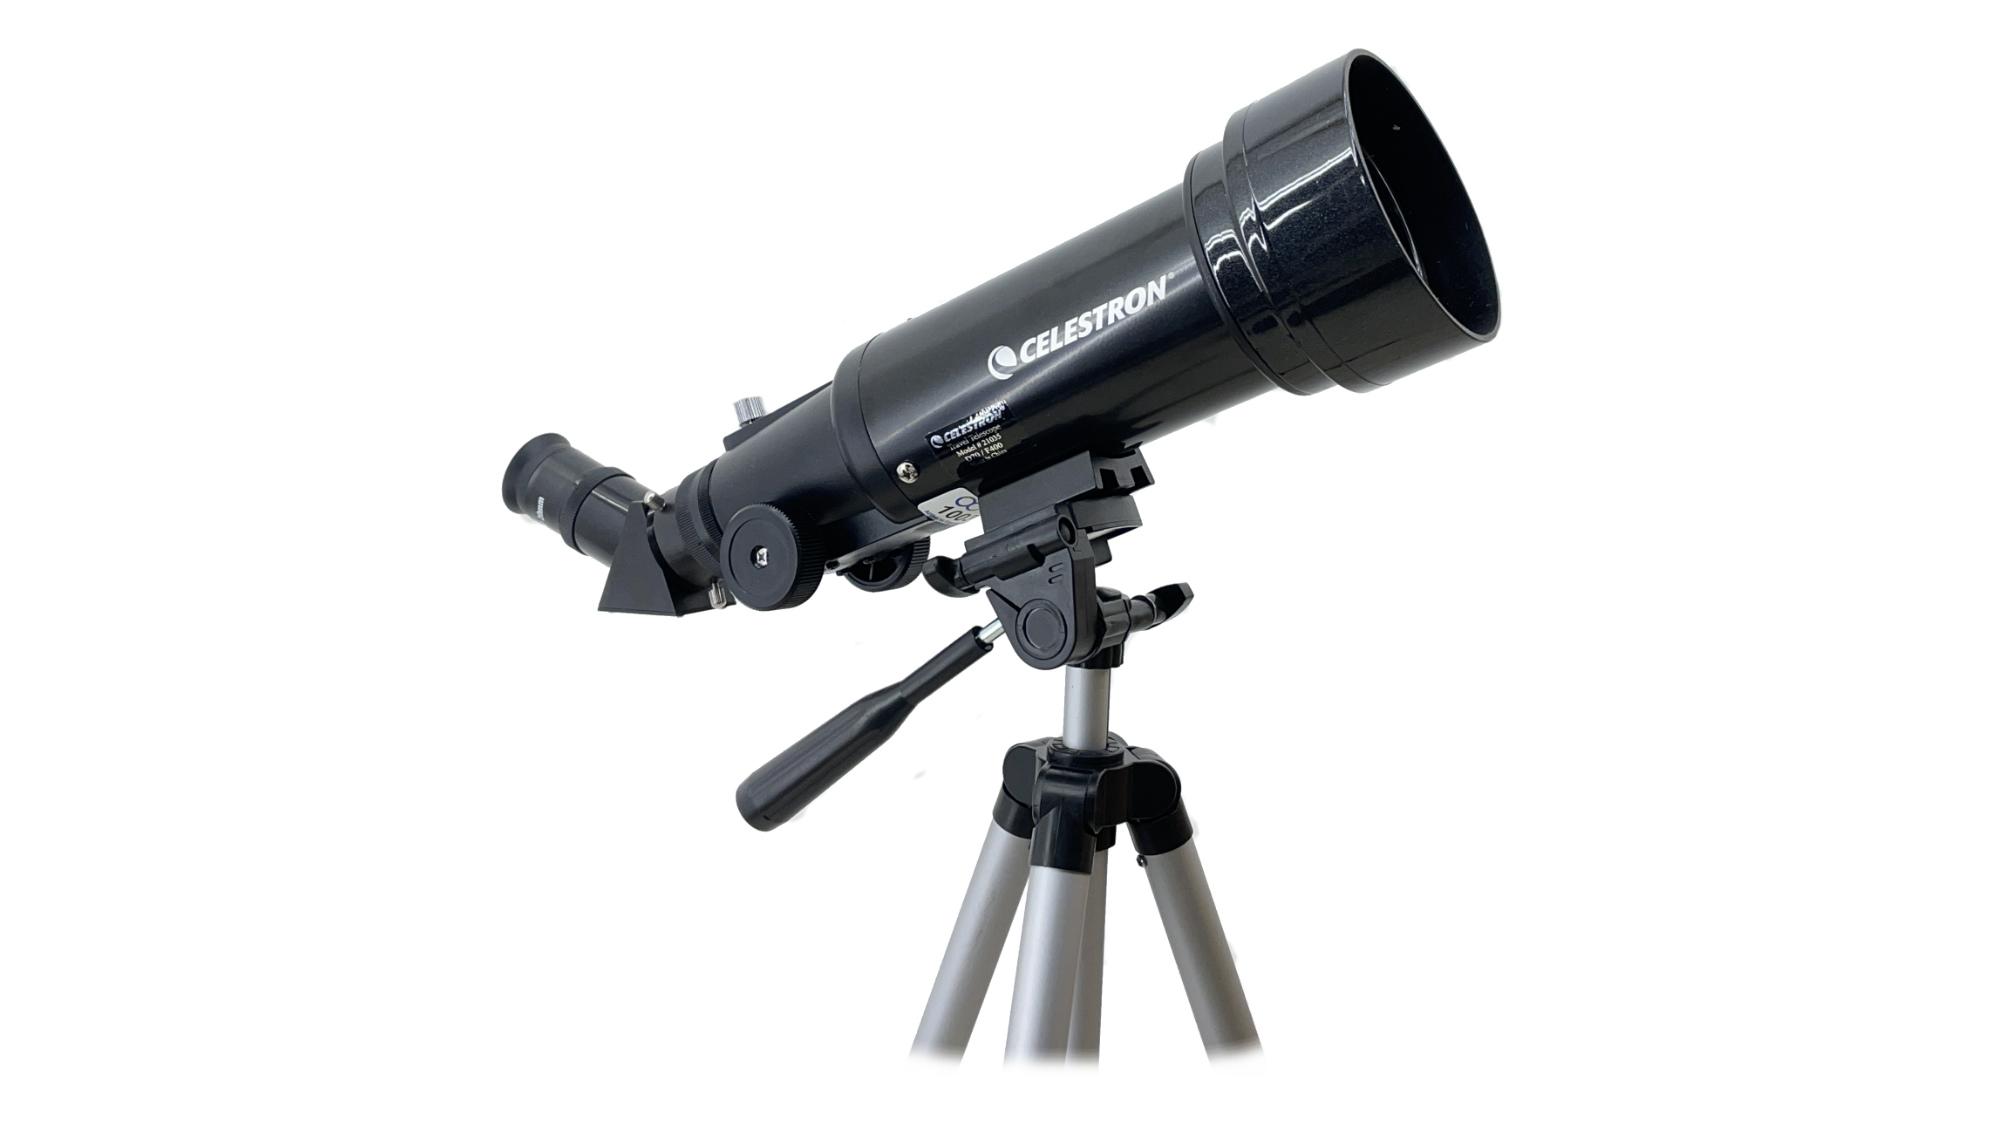 Reiseteleskop leihen